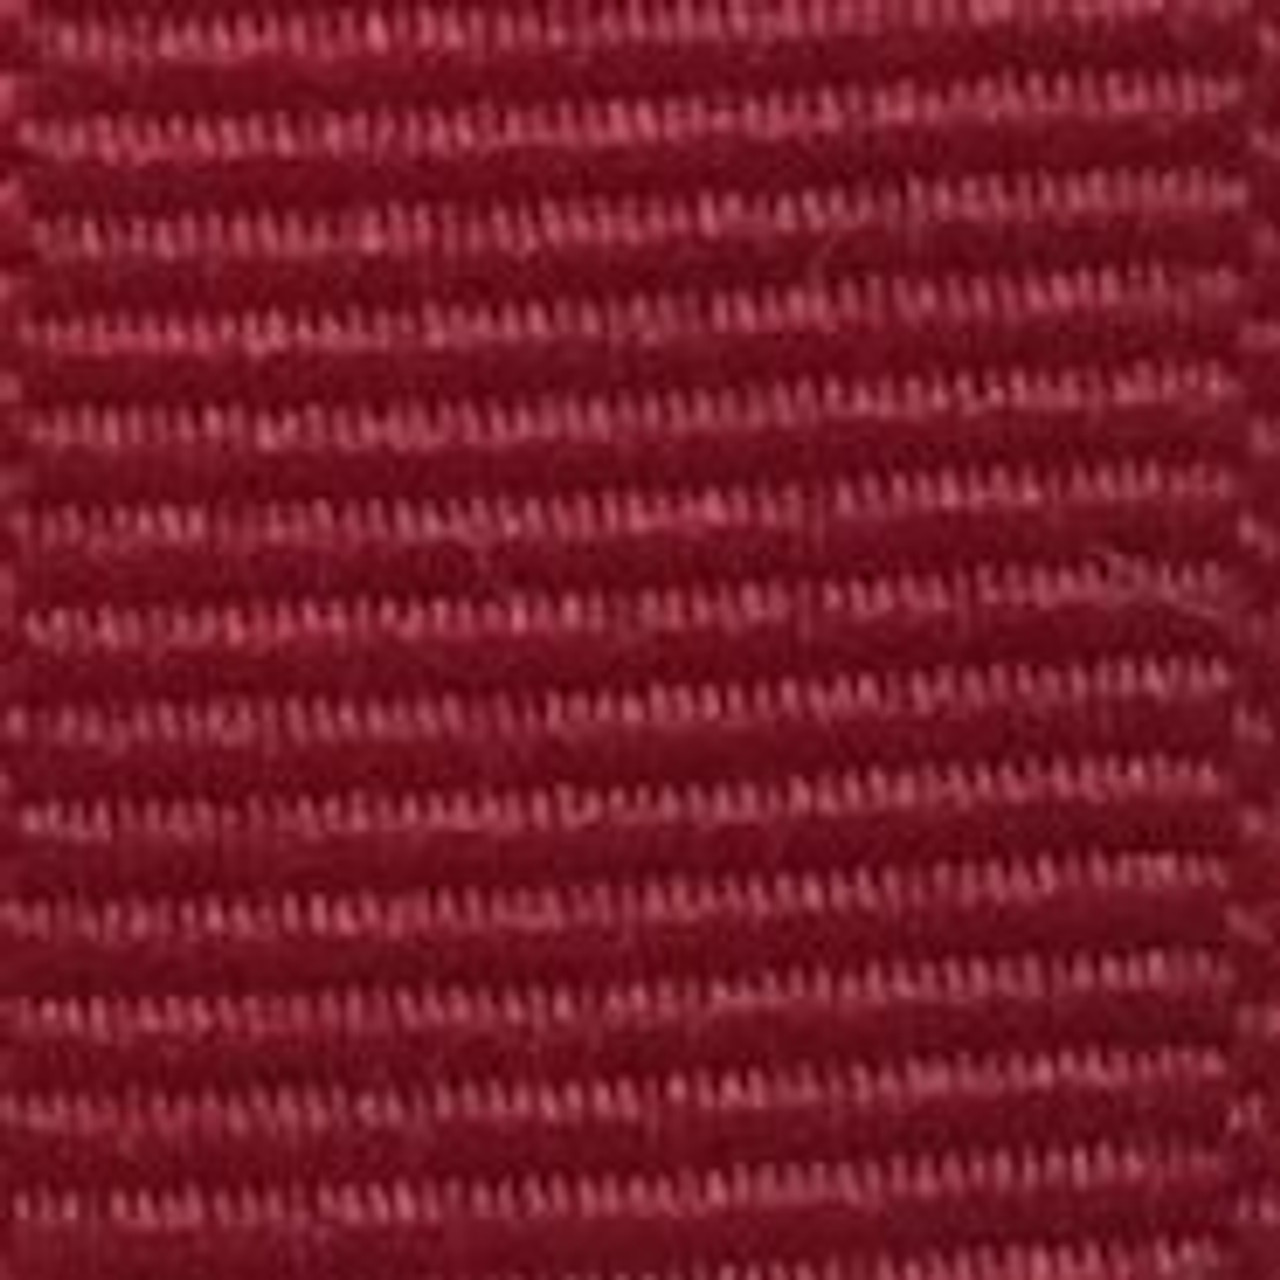 Cranberry Solid Grosgrain Ribbon